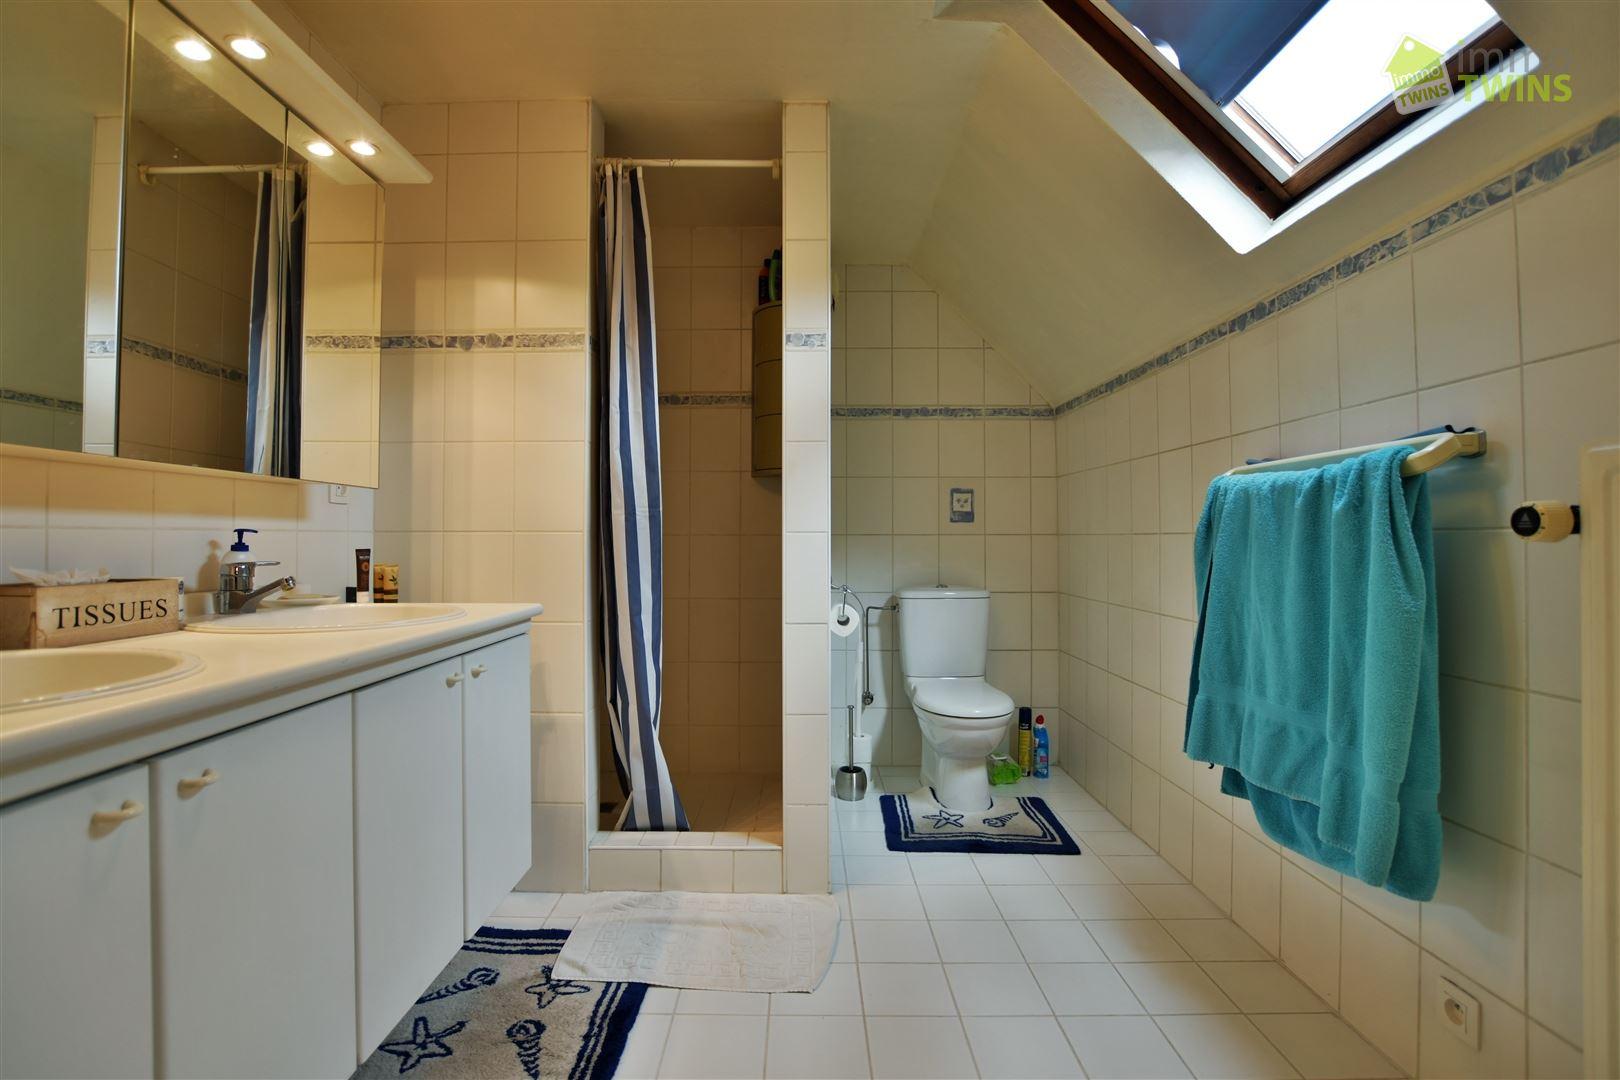 Foto 26 : Duplex/triplex te 9200 Dendermonde (België) - Prijs € 398.000